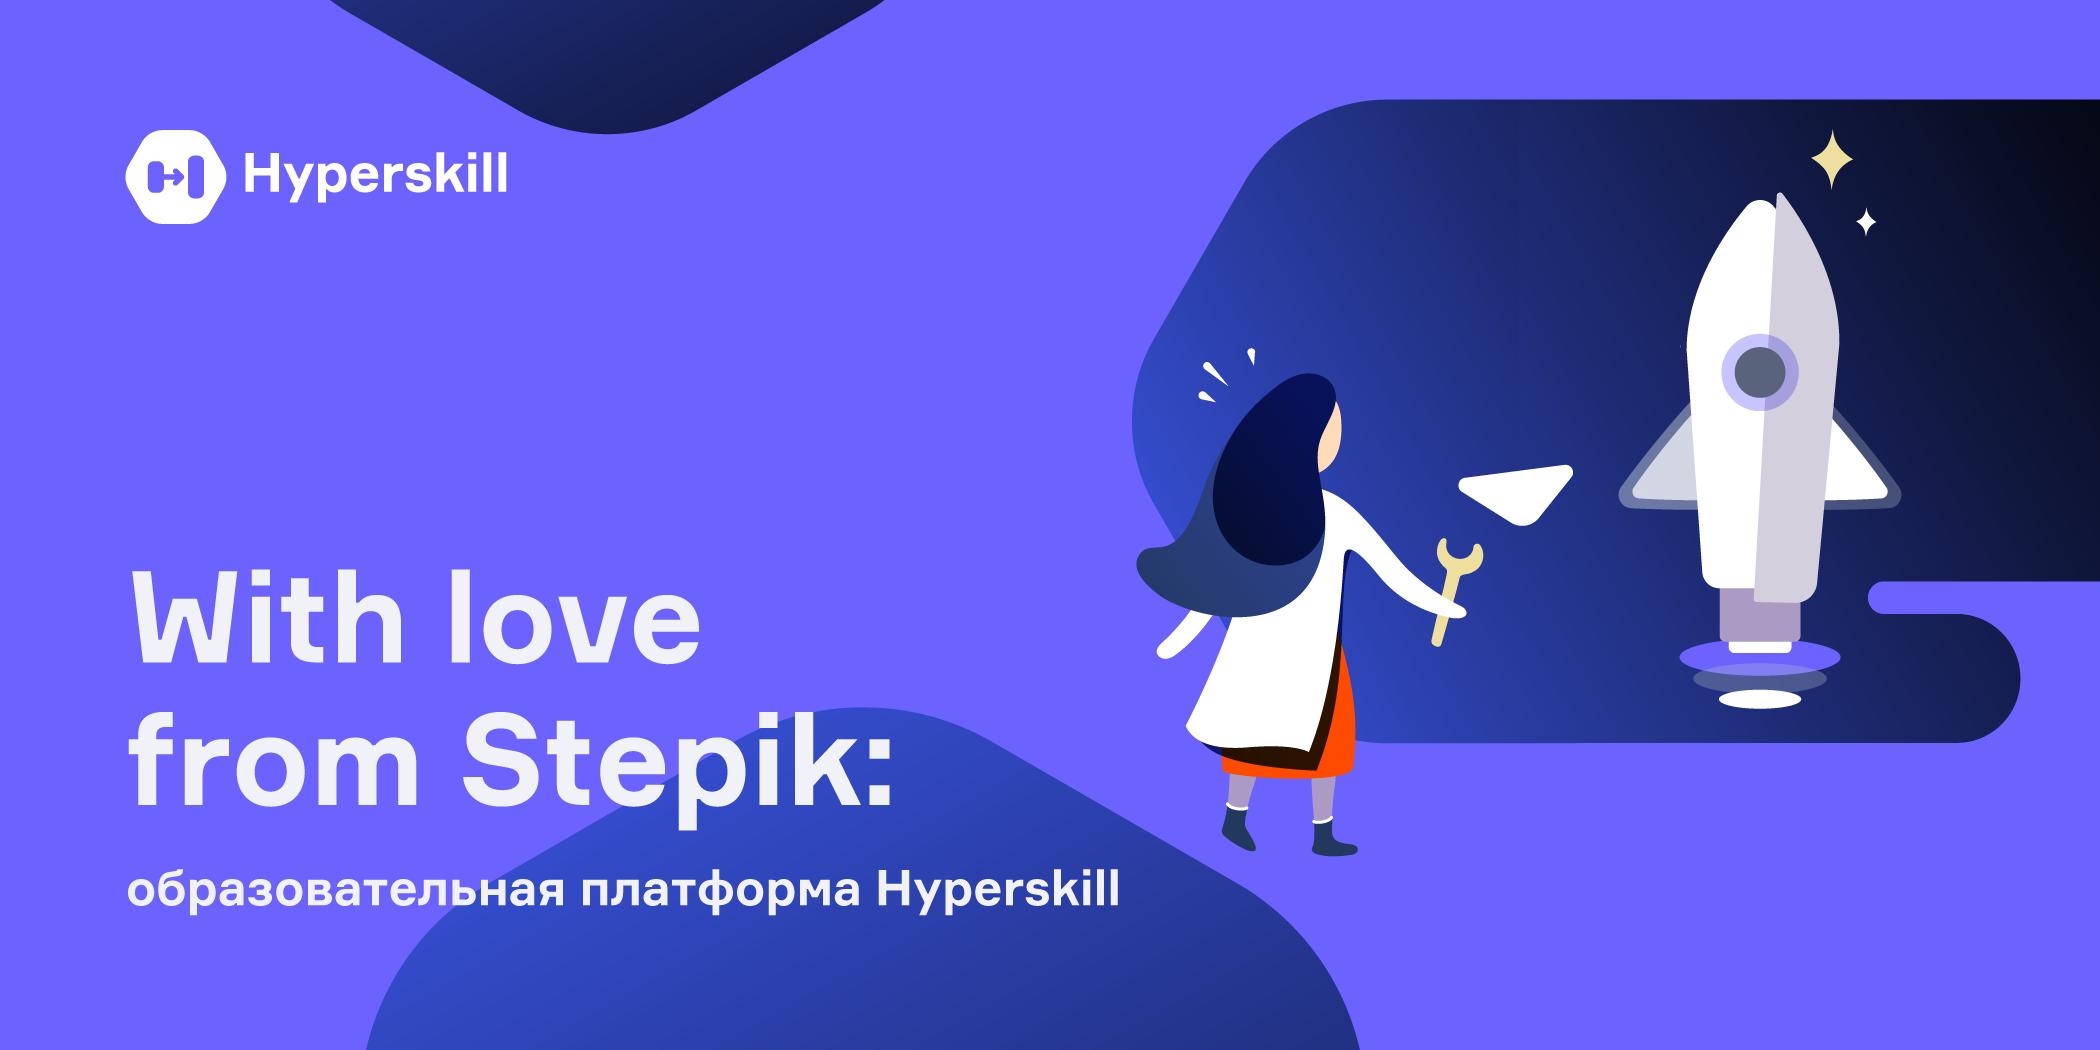 With love from Stepik: образовательная платформа Hyperskill - 1